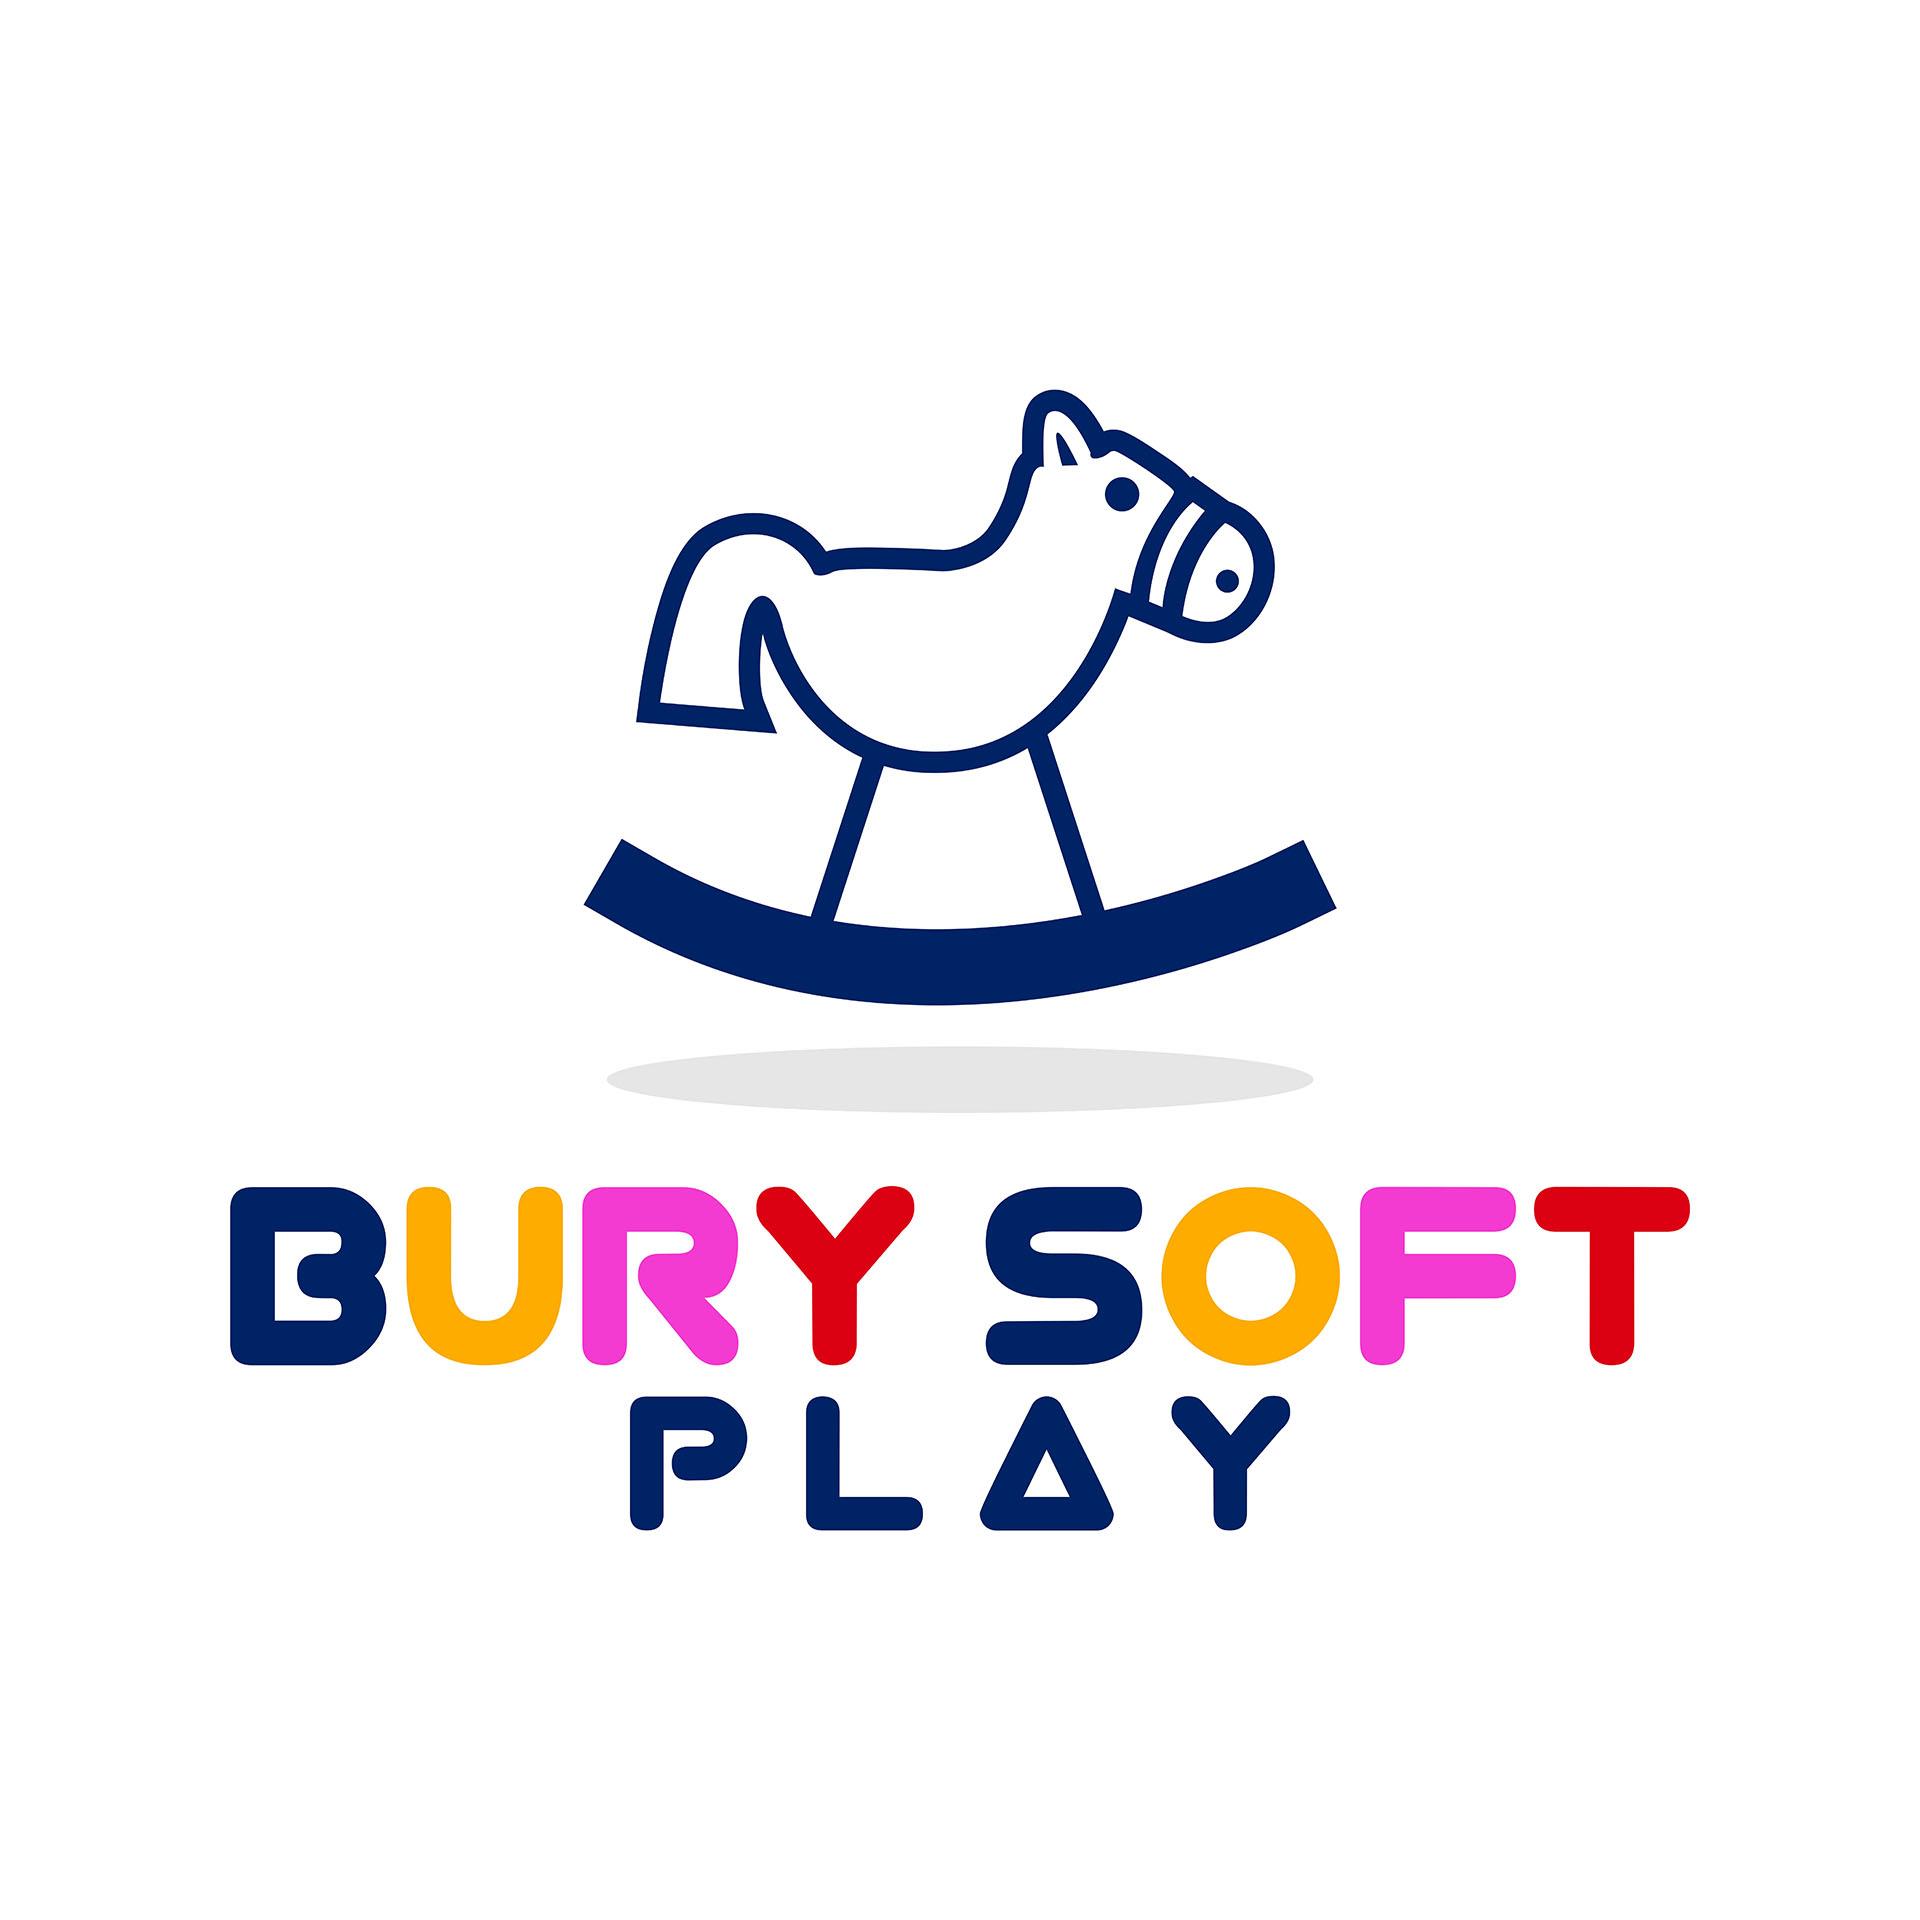 Bury Soft Play's logo